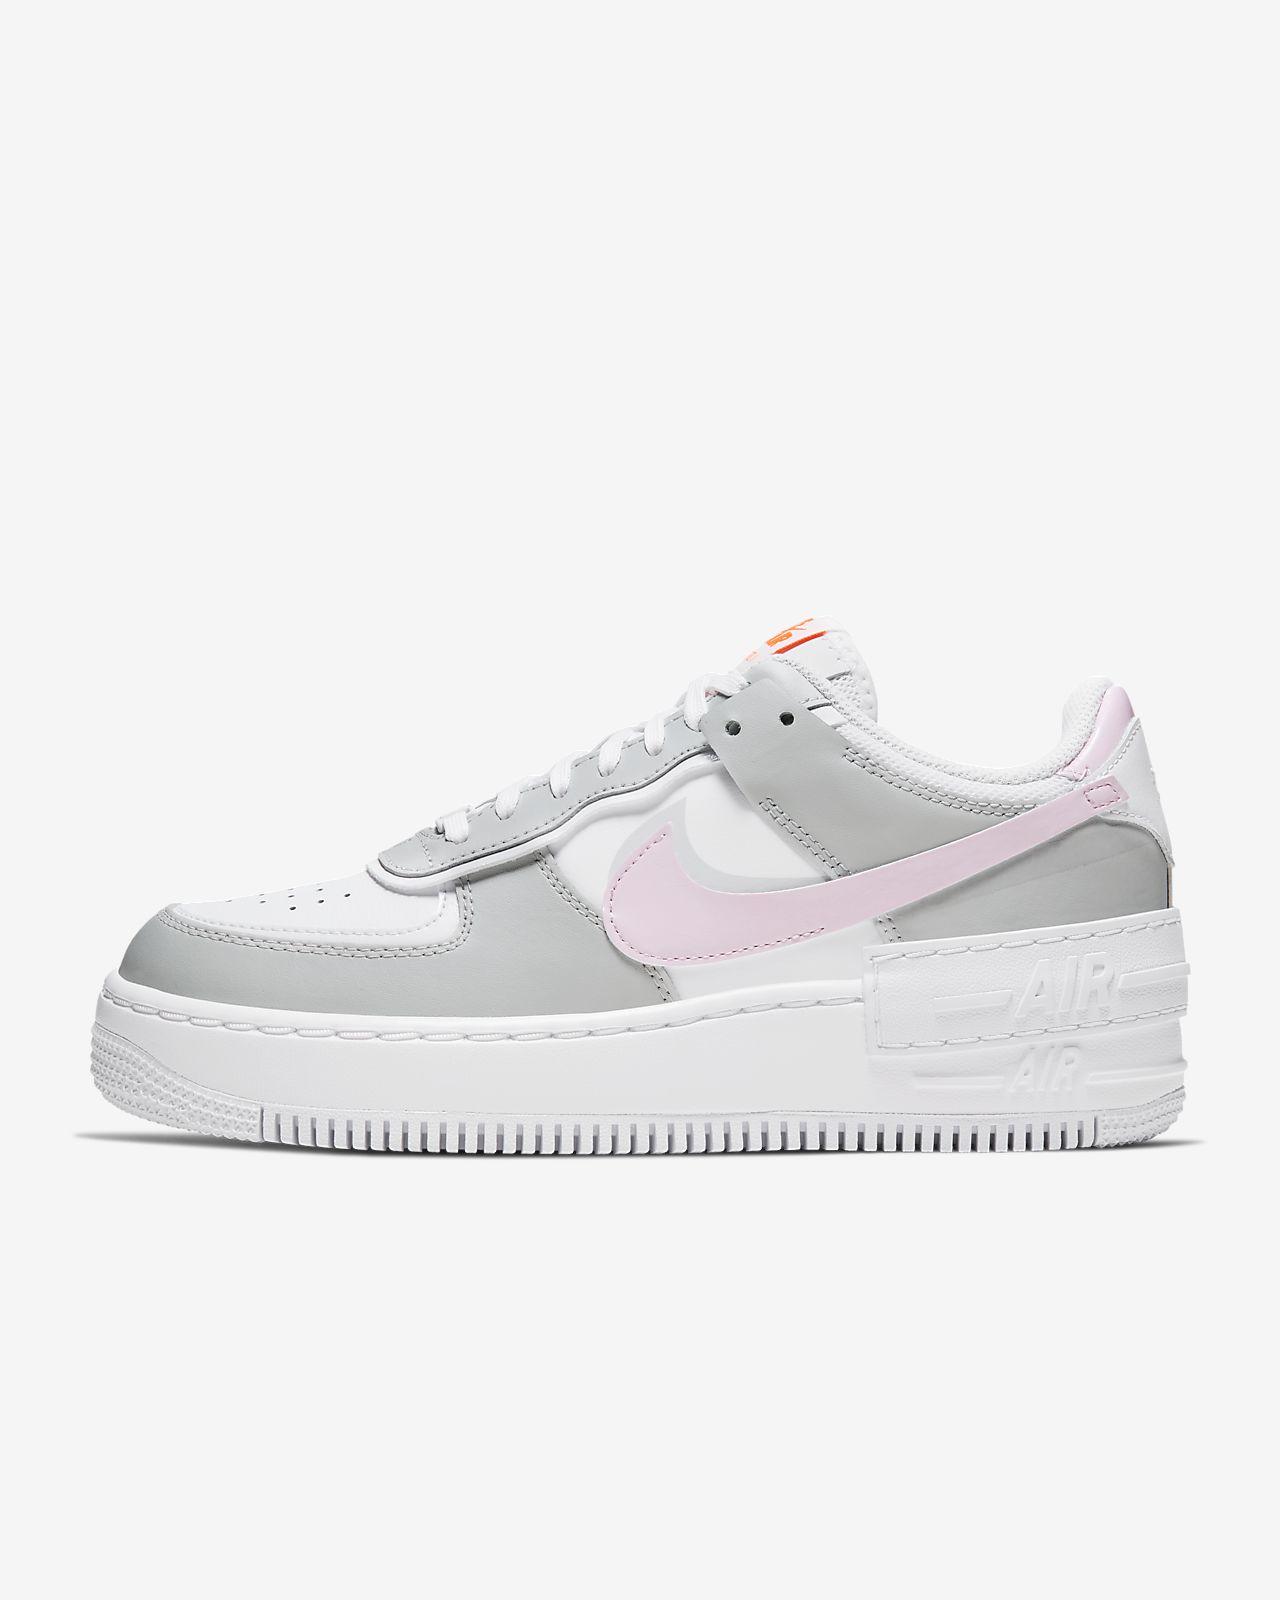 Nike AF 1 Shadow Women's Shoe